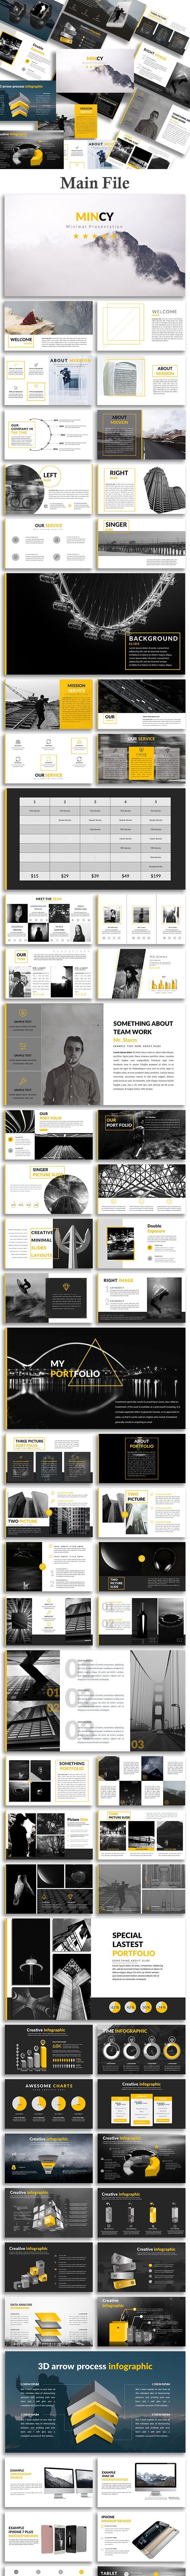 Mincy - Creative PowerPoint Template - Creative PowerPoint Templates